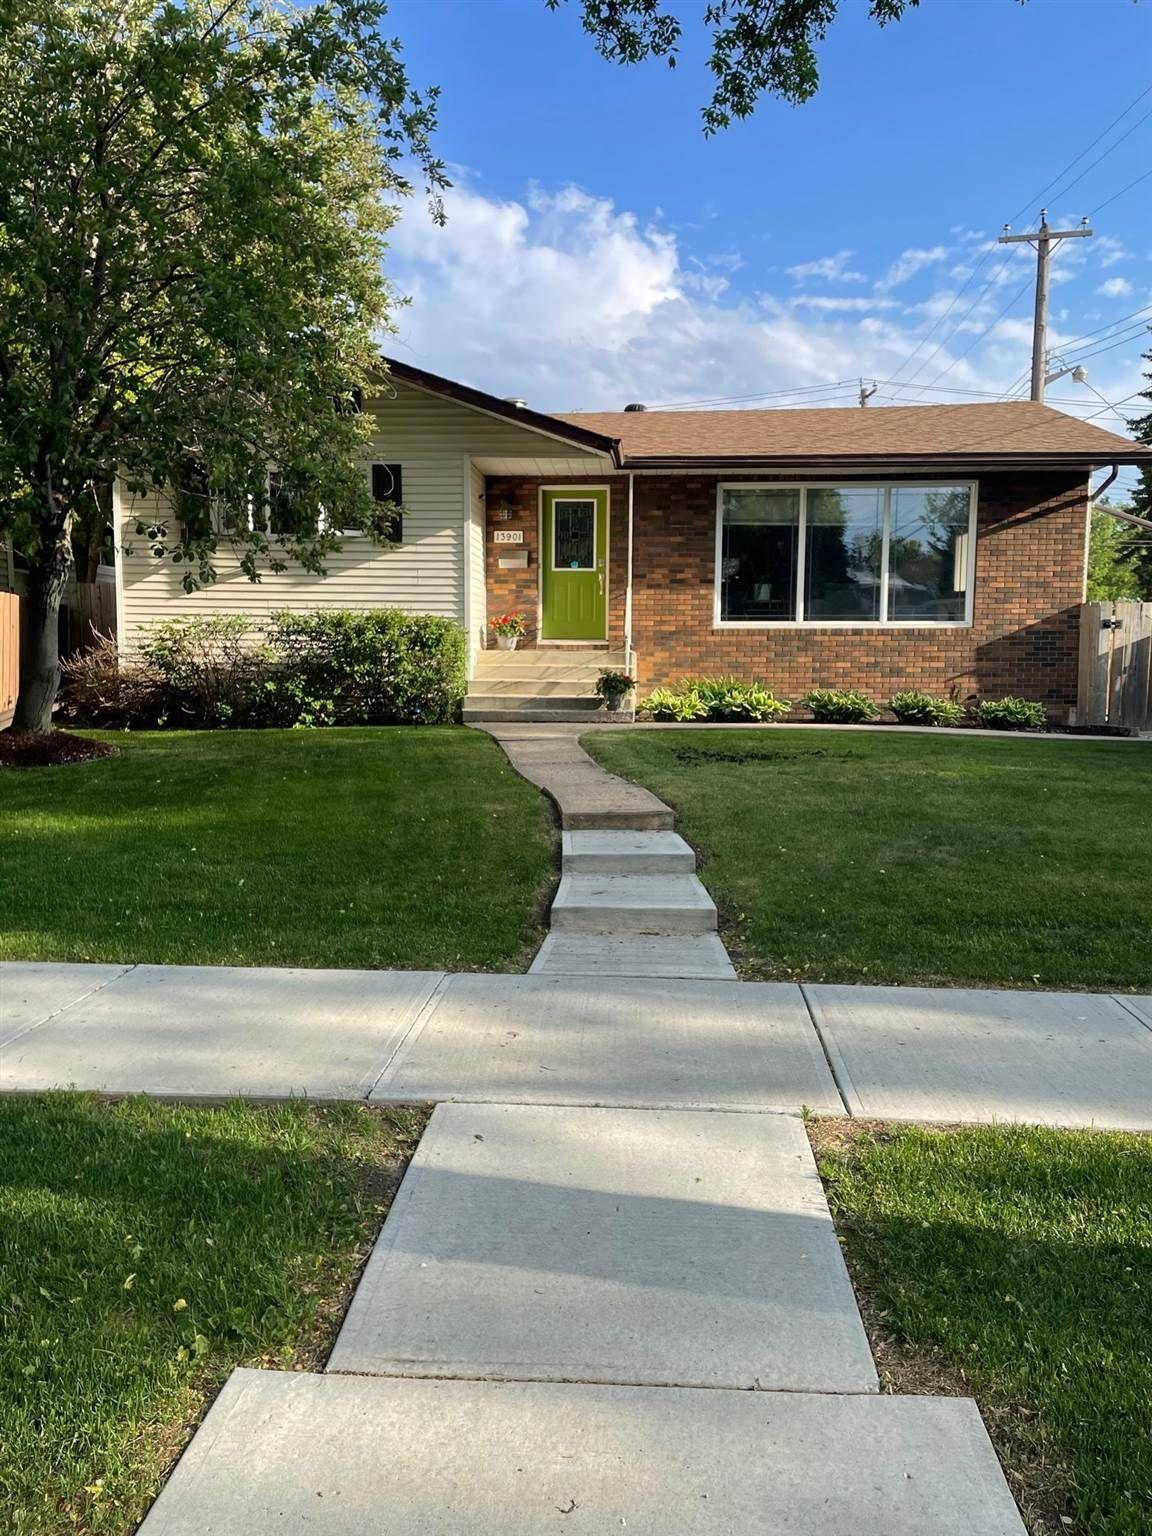 Main Photo: 13901 107A Avenue in Edmonton: Zone 07 House for sale : MLS®# E4252510